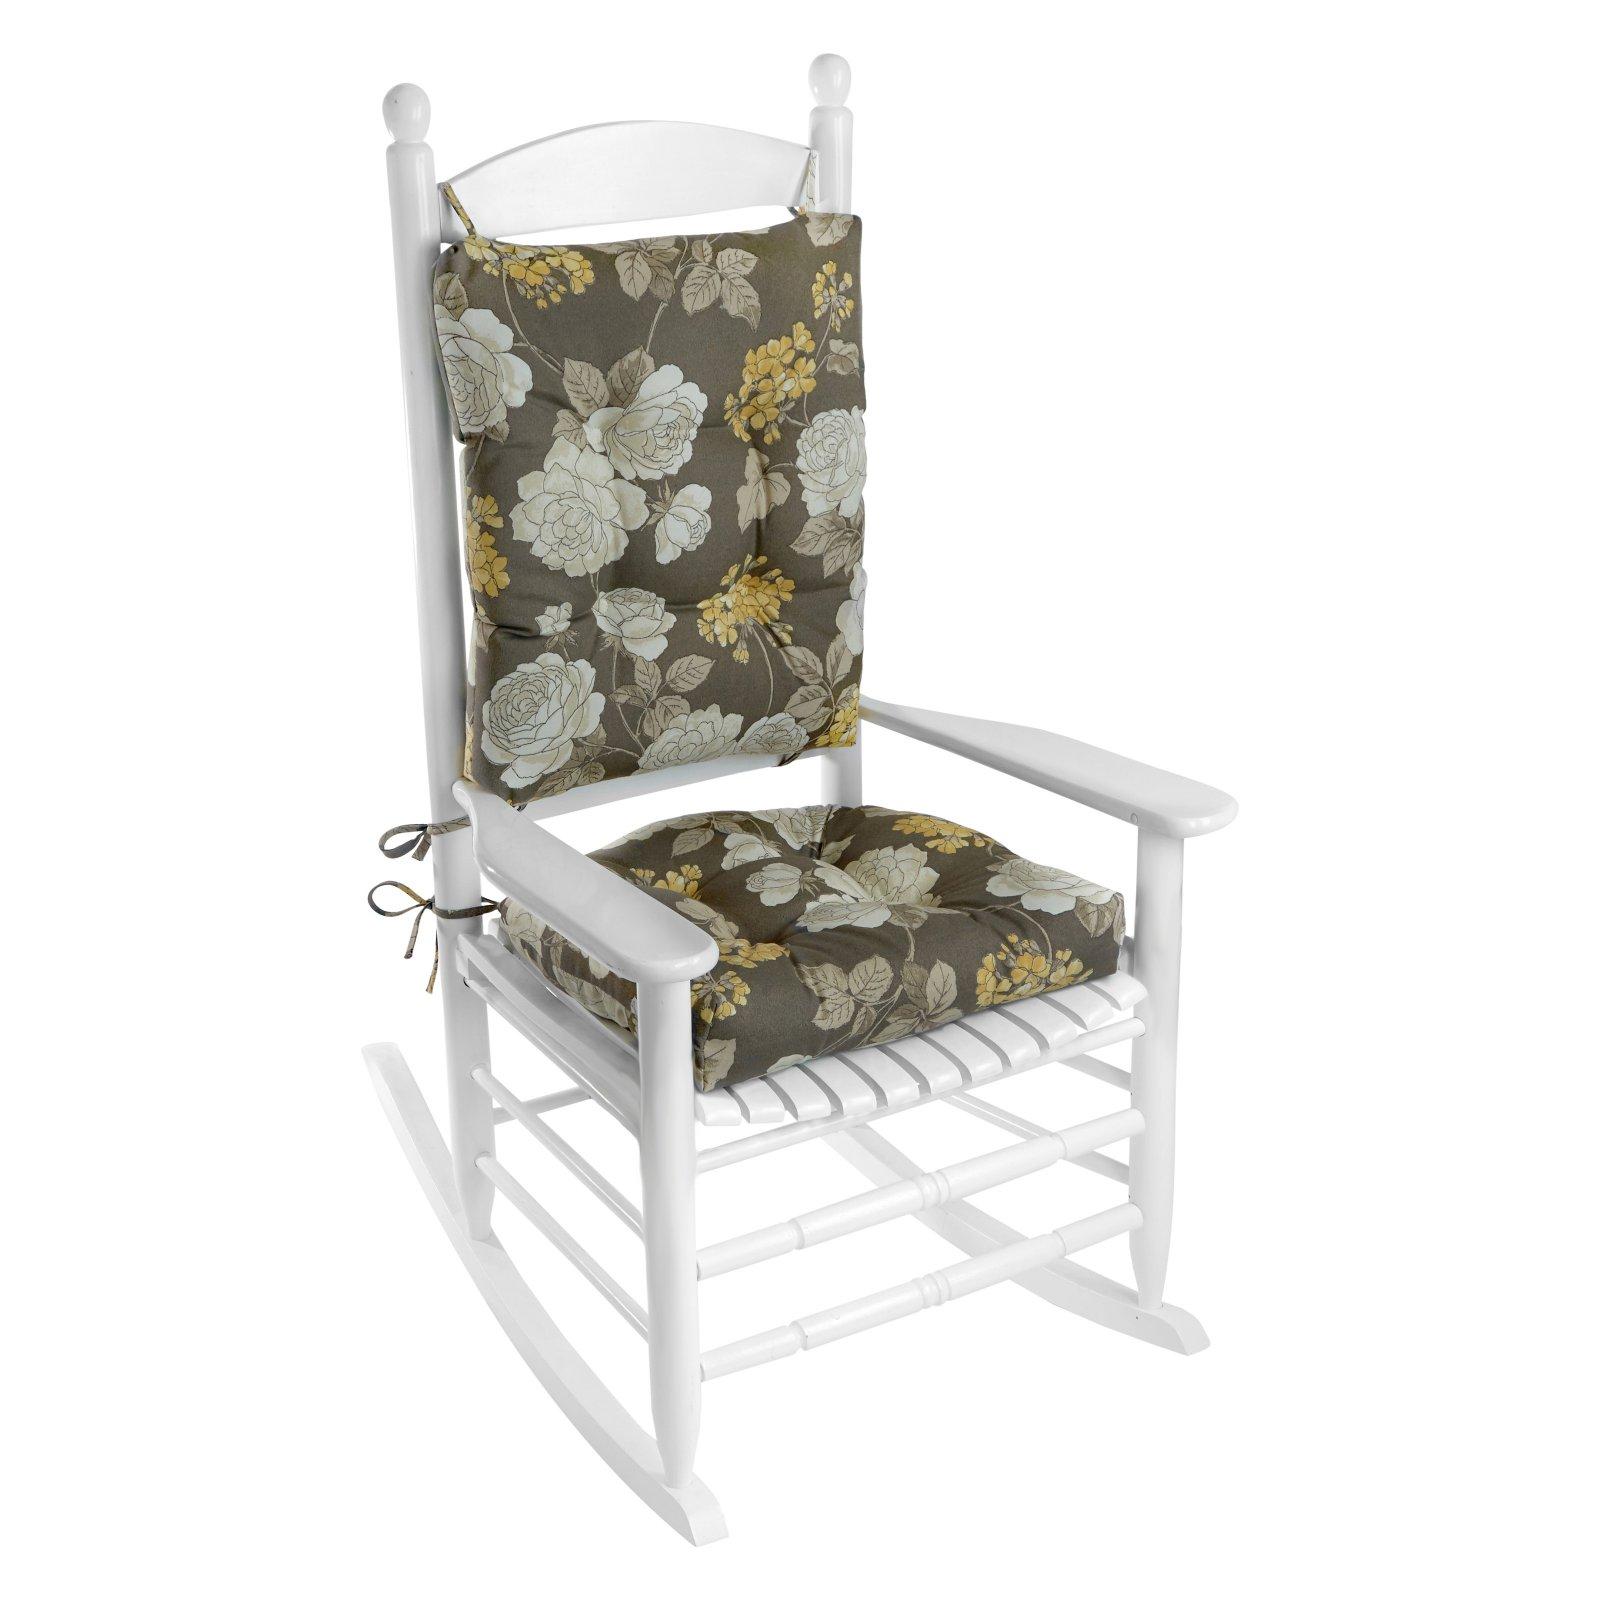 Klear Vu Easy Care 2 Piece Outdoor Rocking Chair Cushion Set